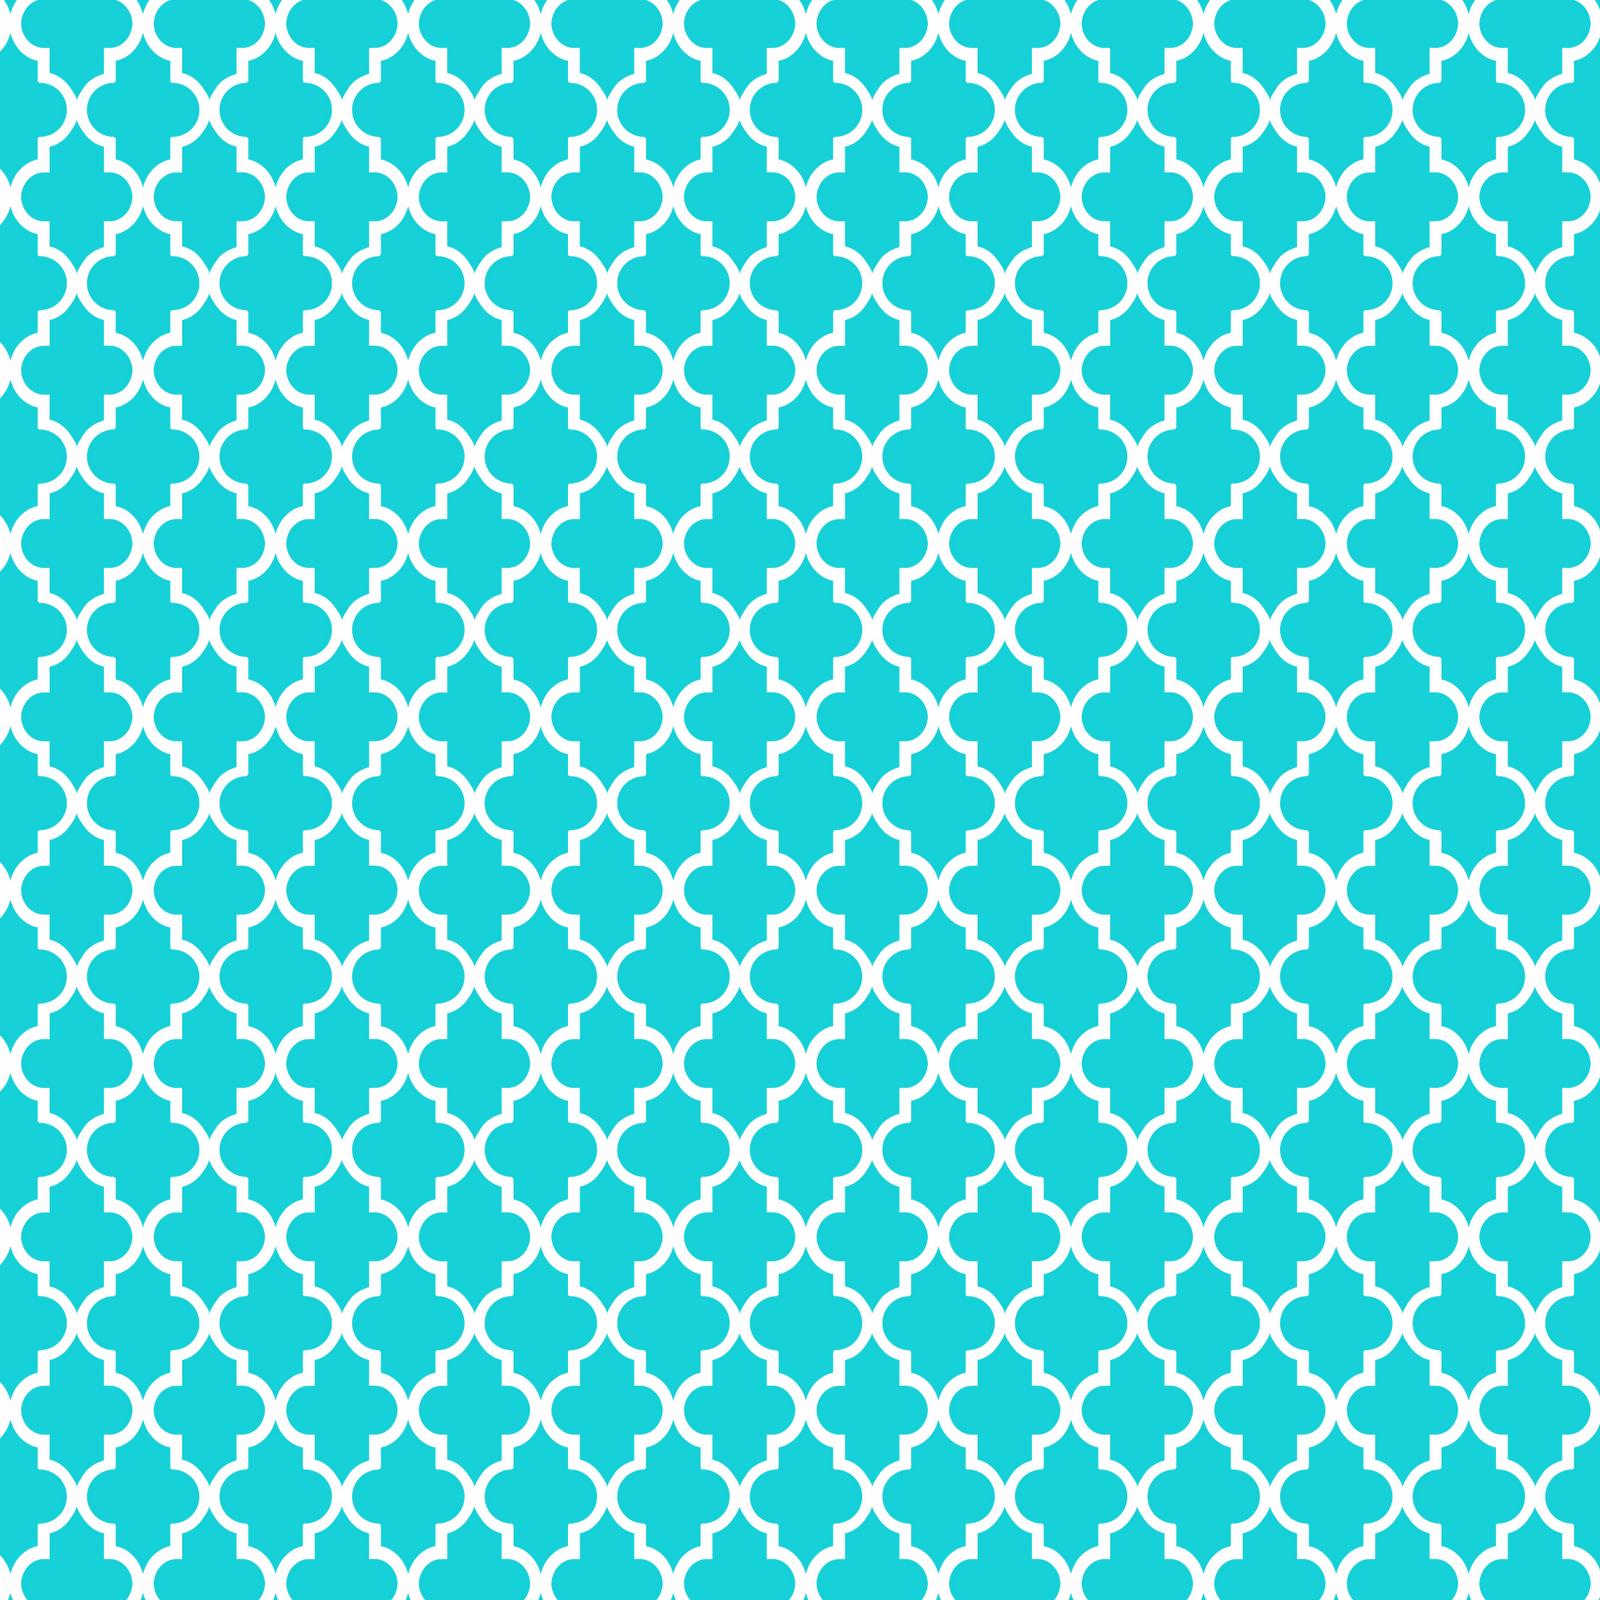 Phi Mu Quatrefoil Free Printable Patterns! No Pink Though - Free Printable Moroccan Pattern